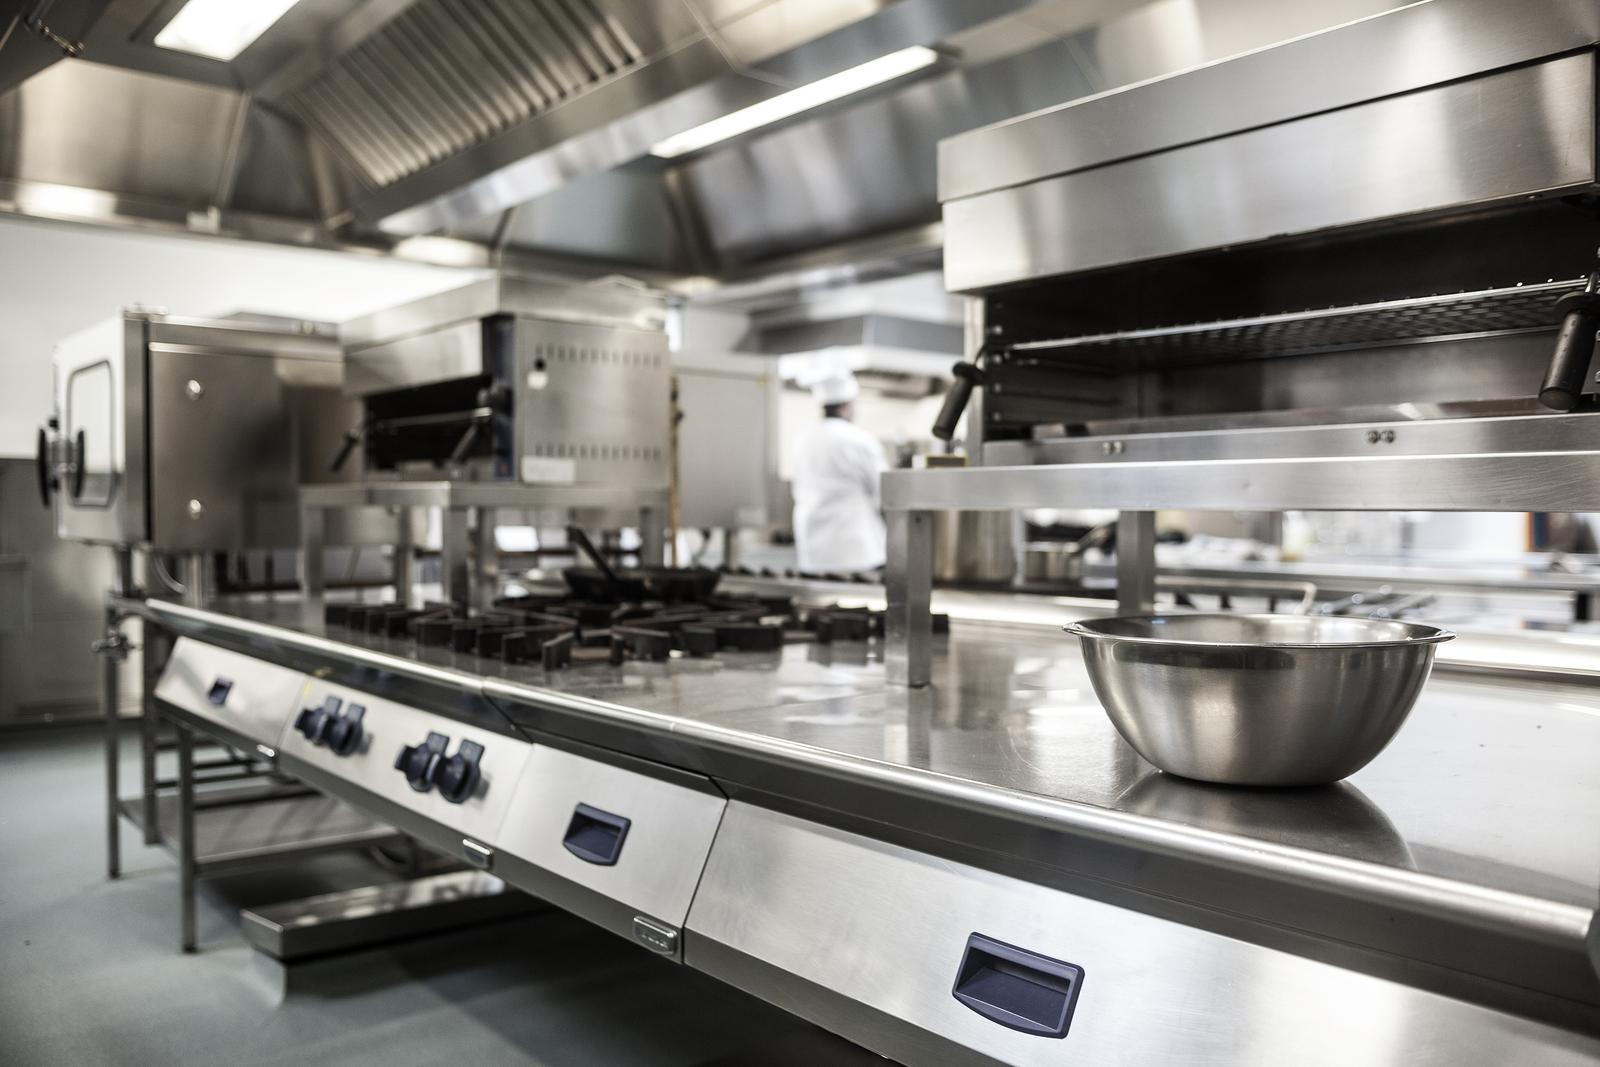 commercial kitchen equipment manufacturer pune